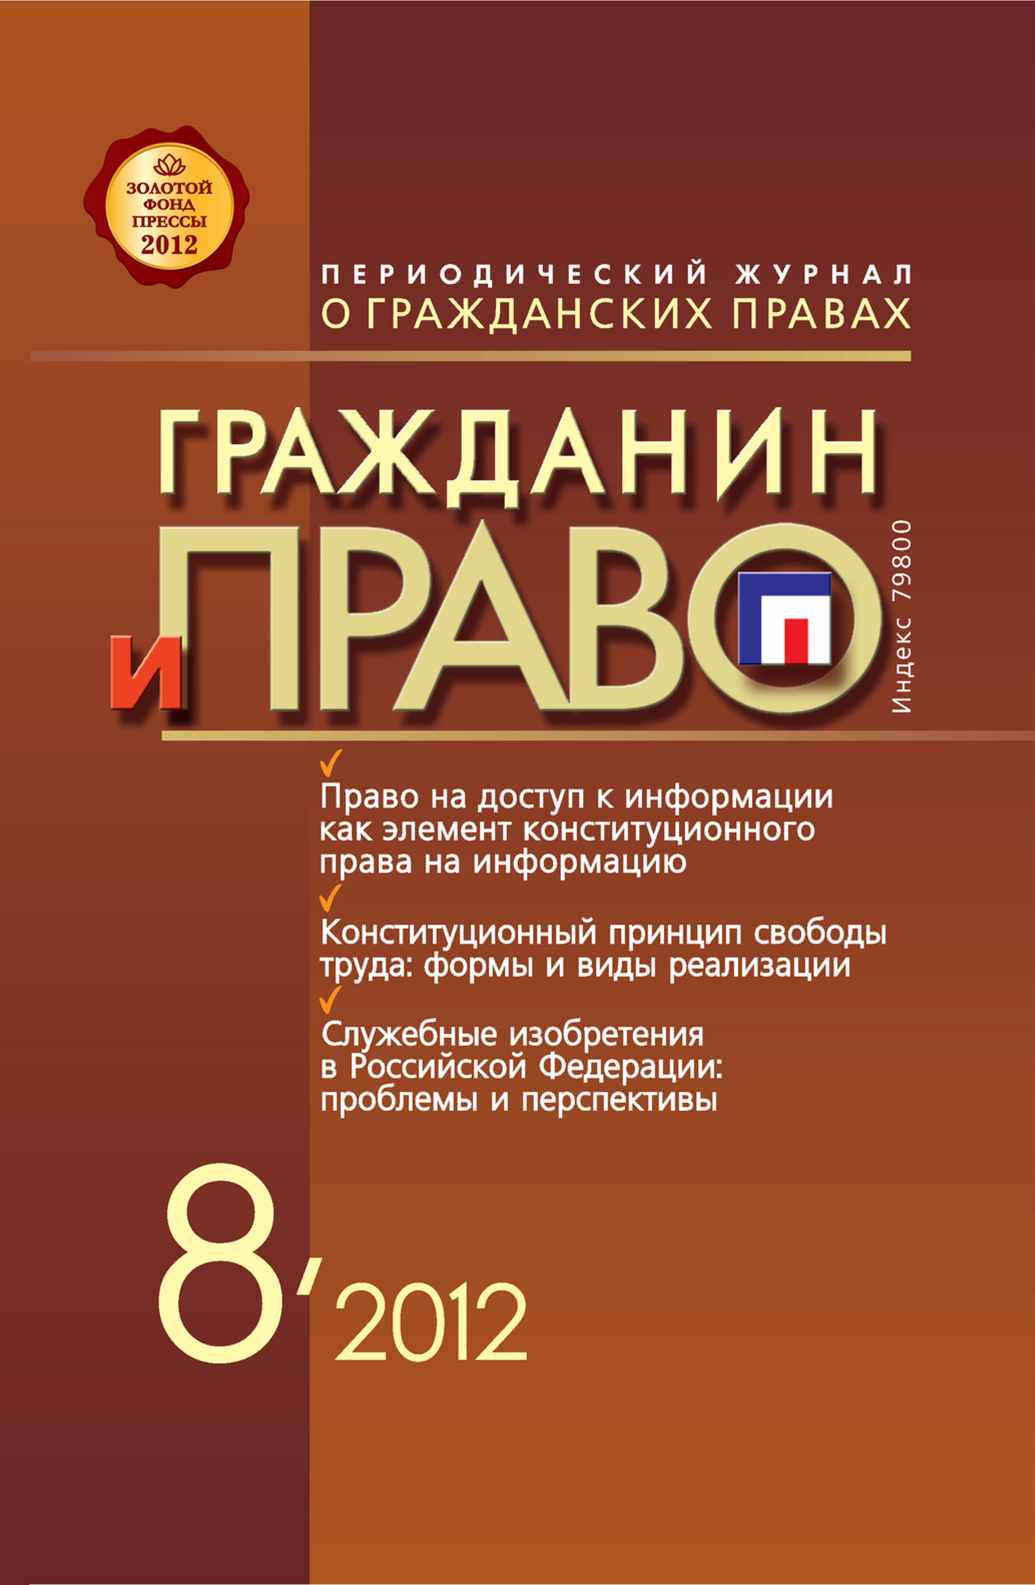 Гражданин и право №08/2012